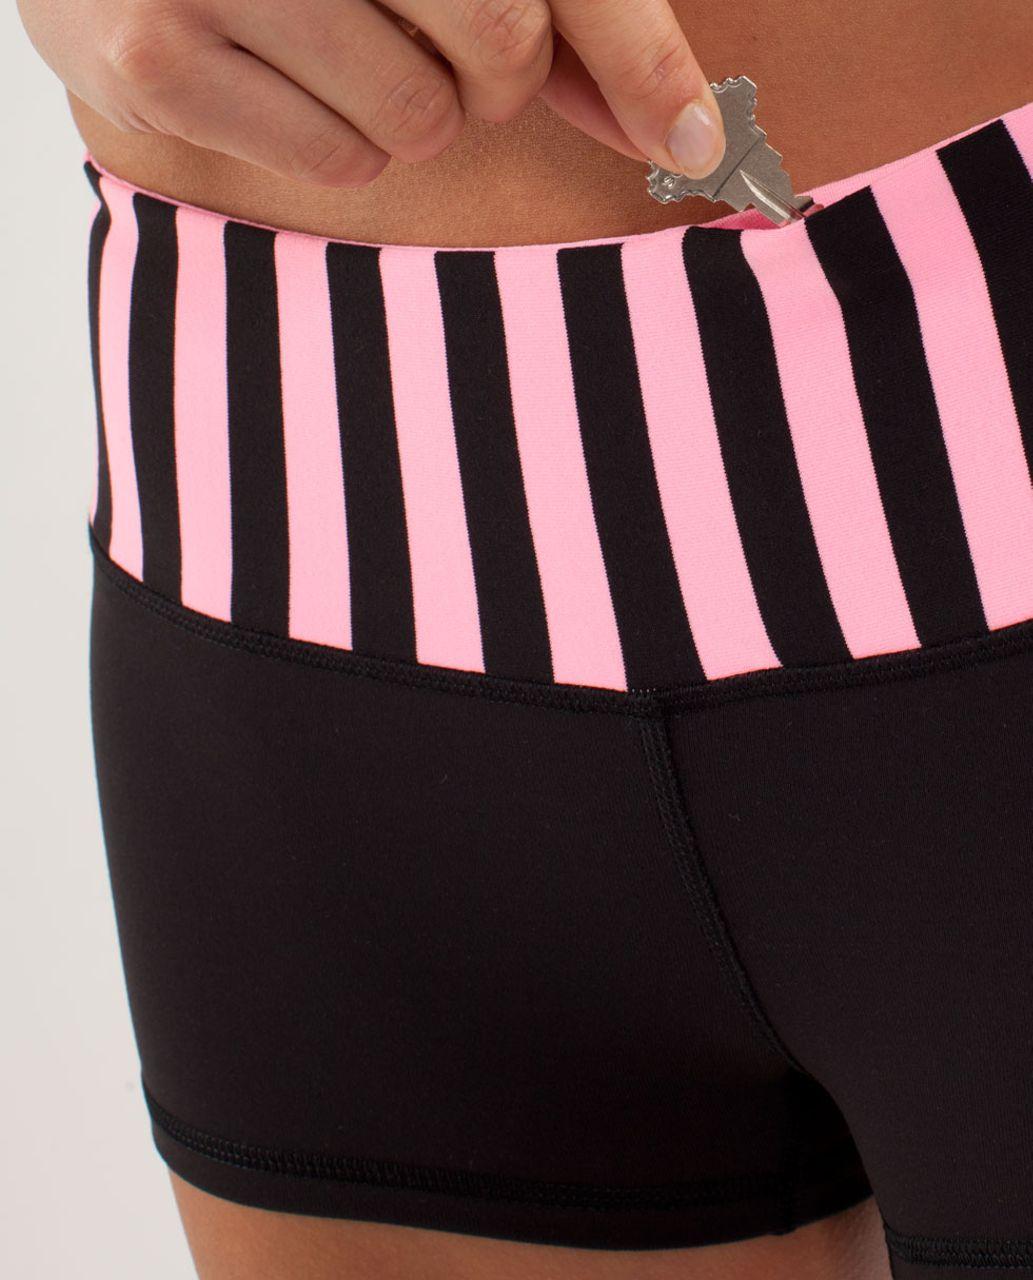 Lululemon Boogie Short - Black / Sea Stripe Pink Shell / Pink Shell